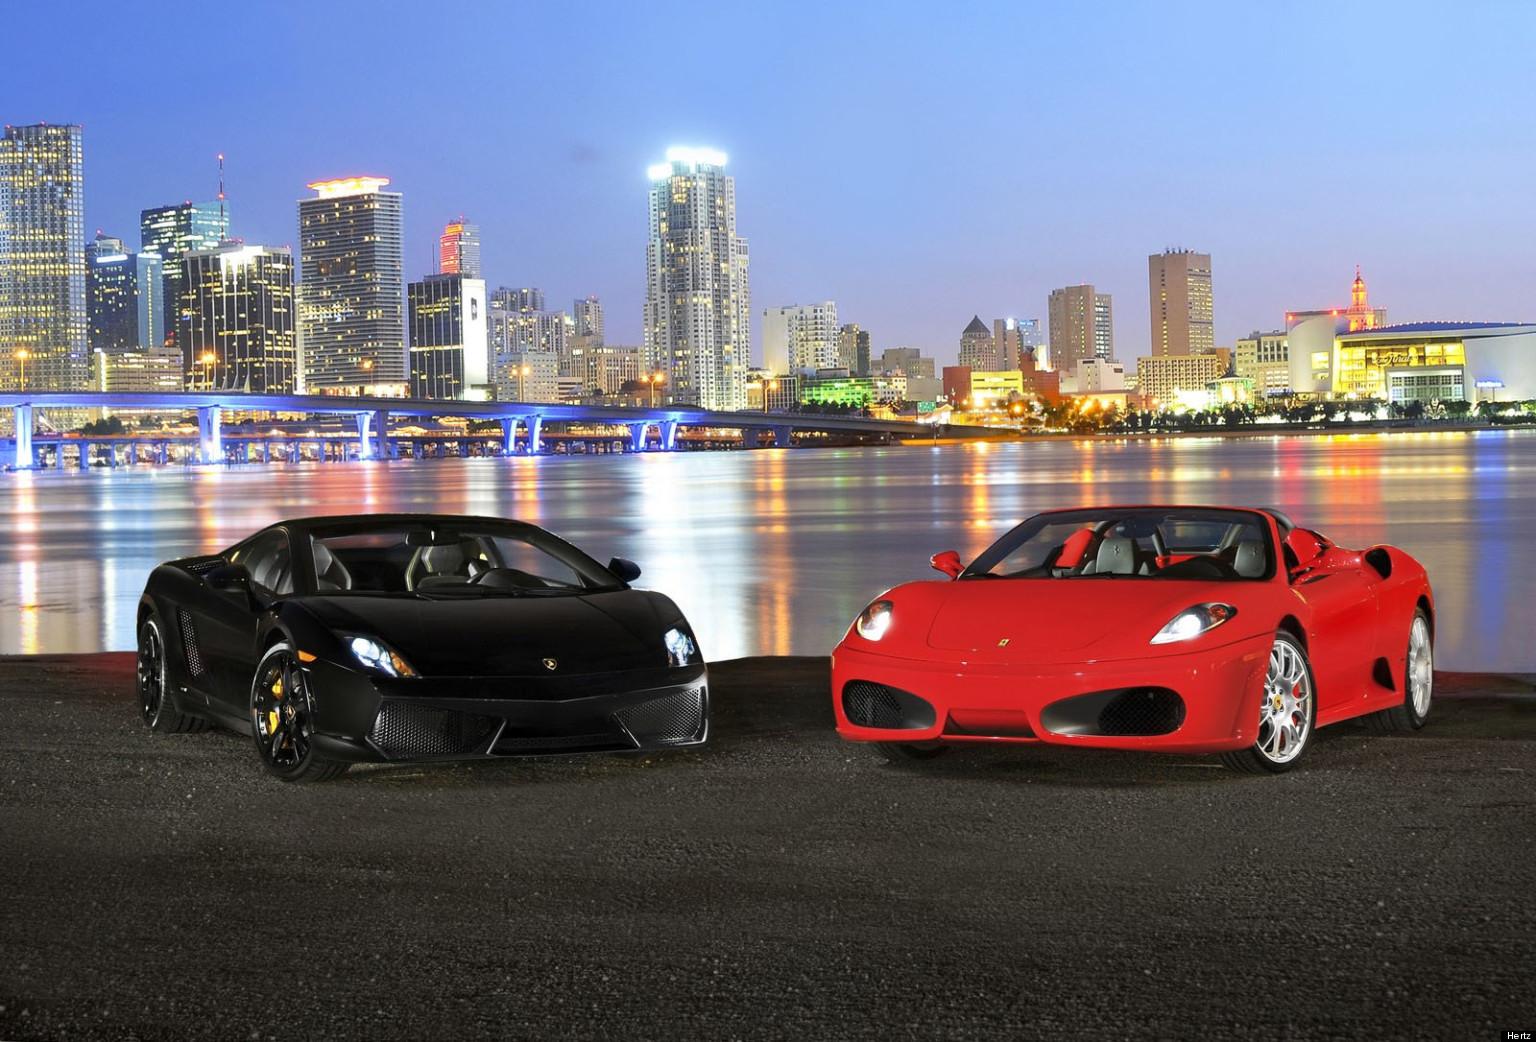 Hertz Dream Cars™ is an innovative evolution in car rental.